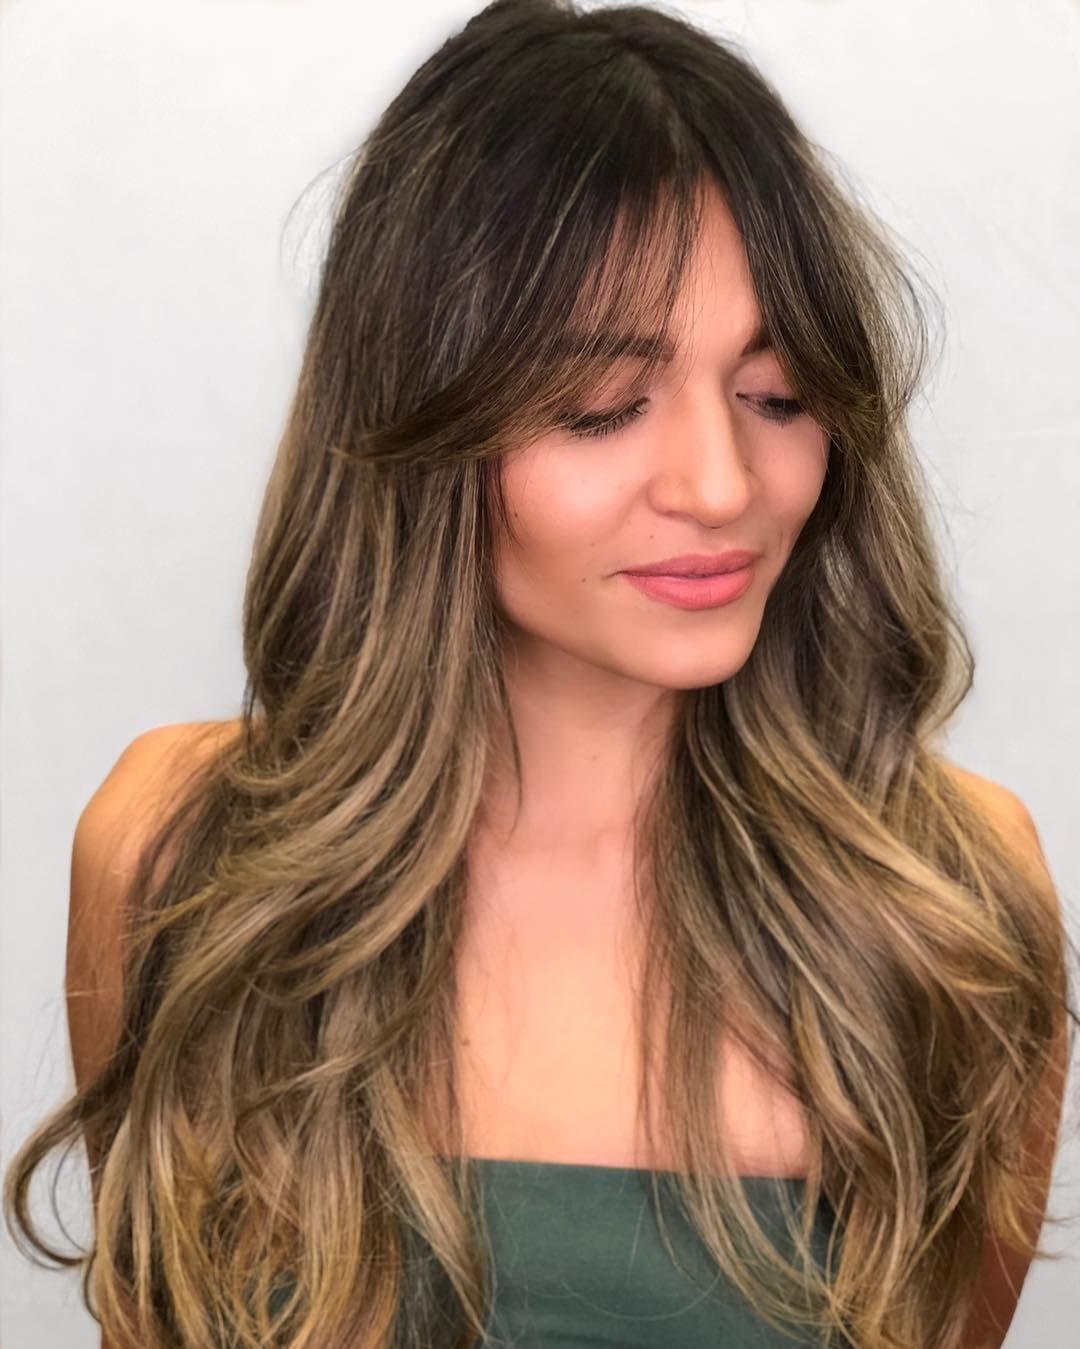 "Karla Valenzuela REDKEN ARTIST on Instagram: ""Loving these trending curtain bangs on @jennnking!!! ????I used @samvillahair cutting tools, shampooed her with #blondageshampoo and styled…"" #curtainbangs curtain bangs"